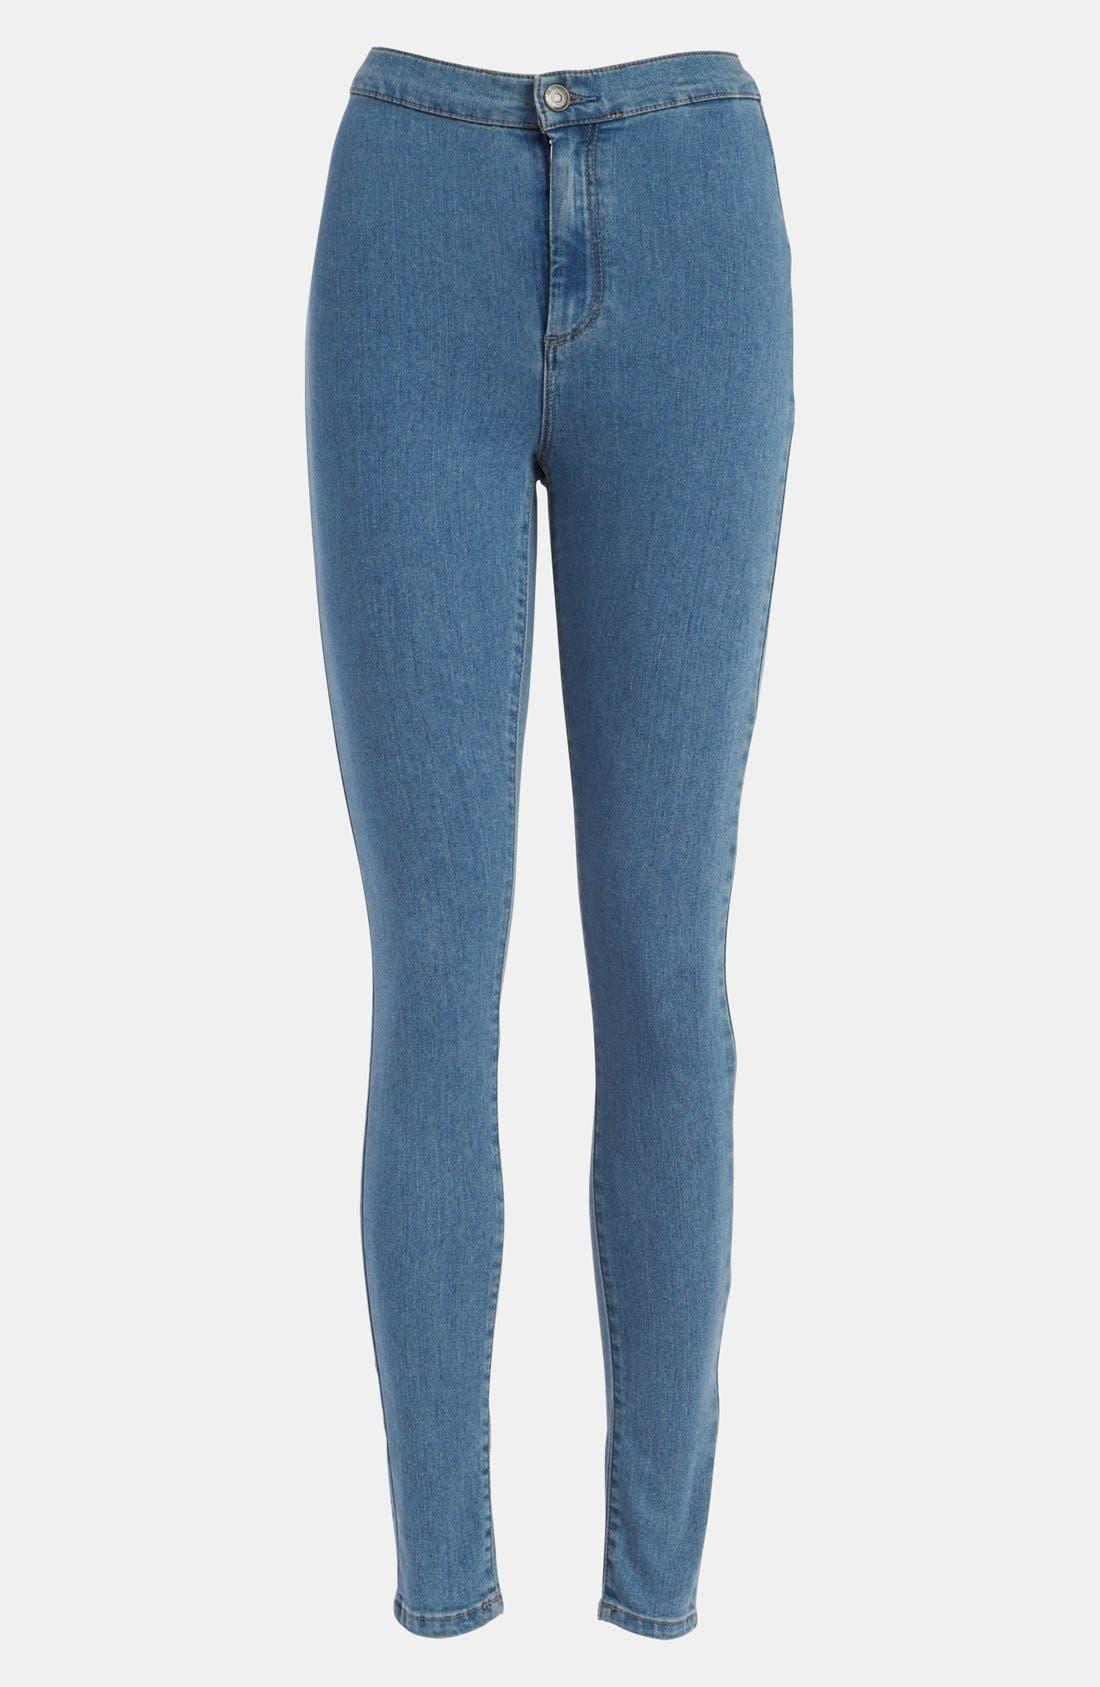 Alternate Image 1 Selected - Topshop Moto 'Joni Disco' High Waisted Jeans